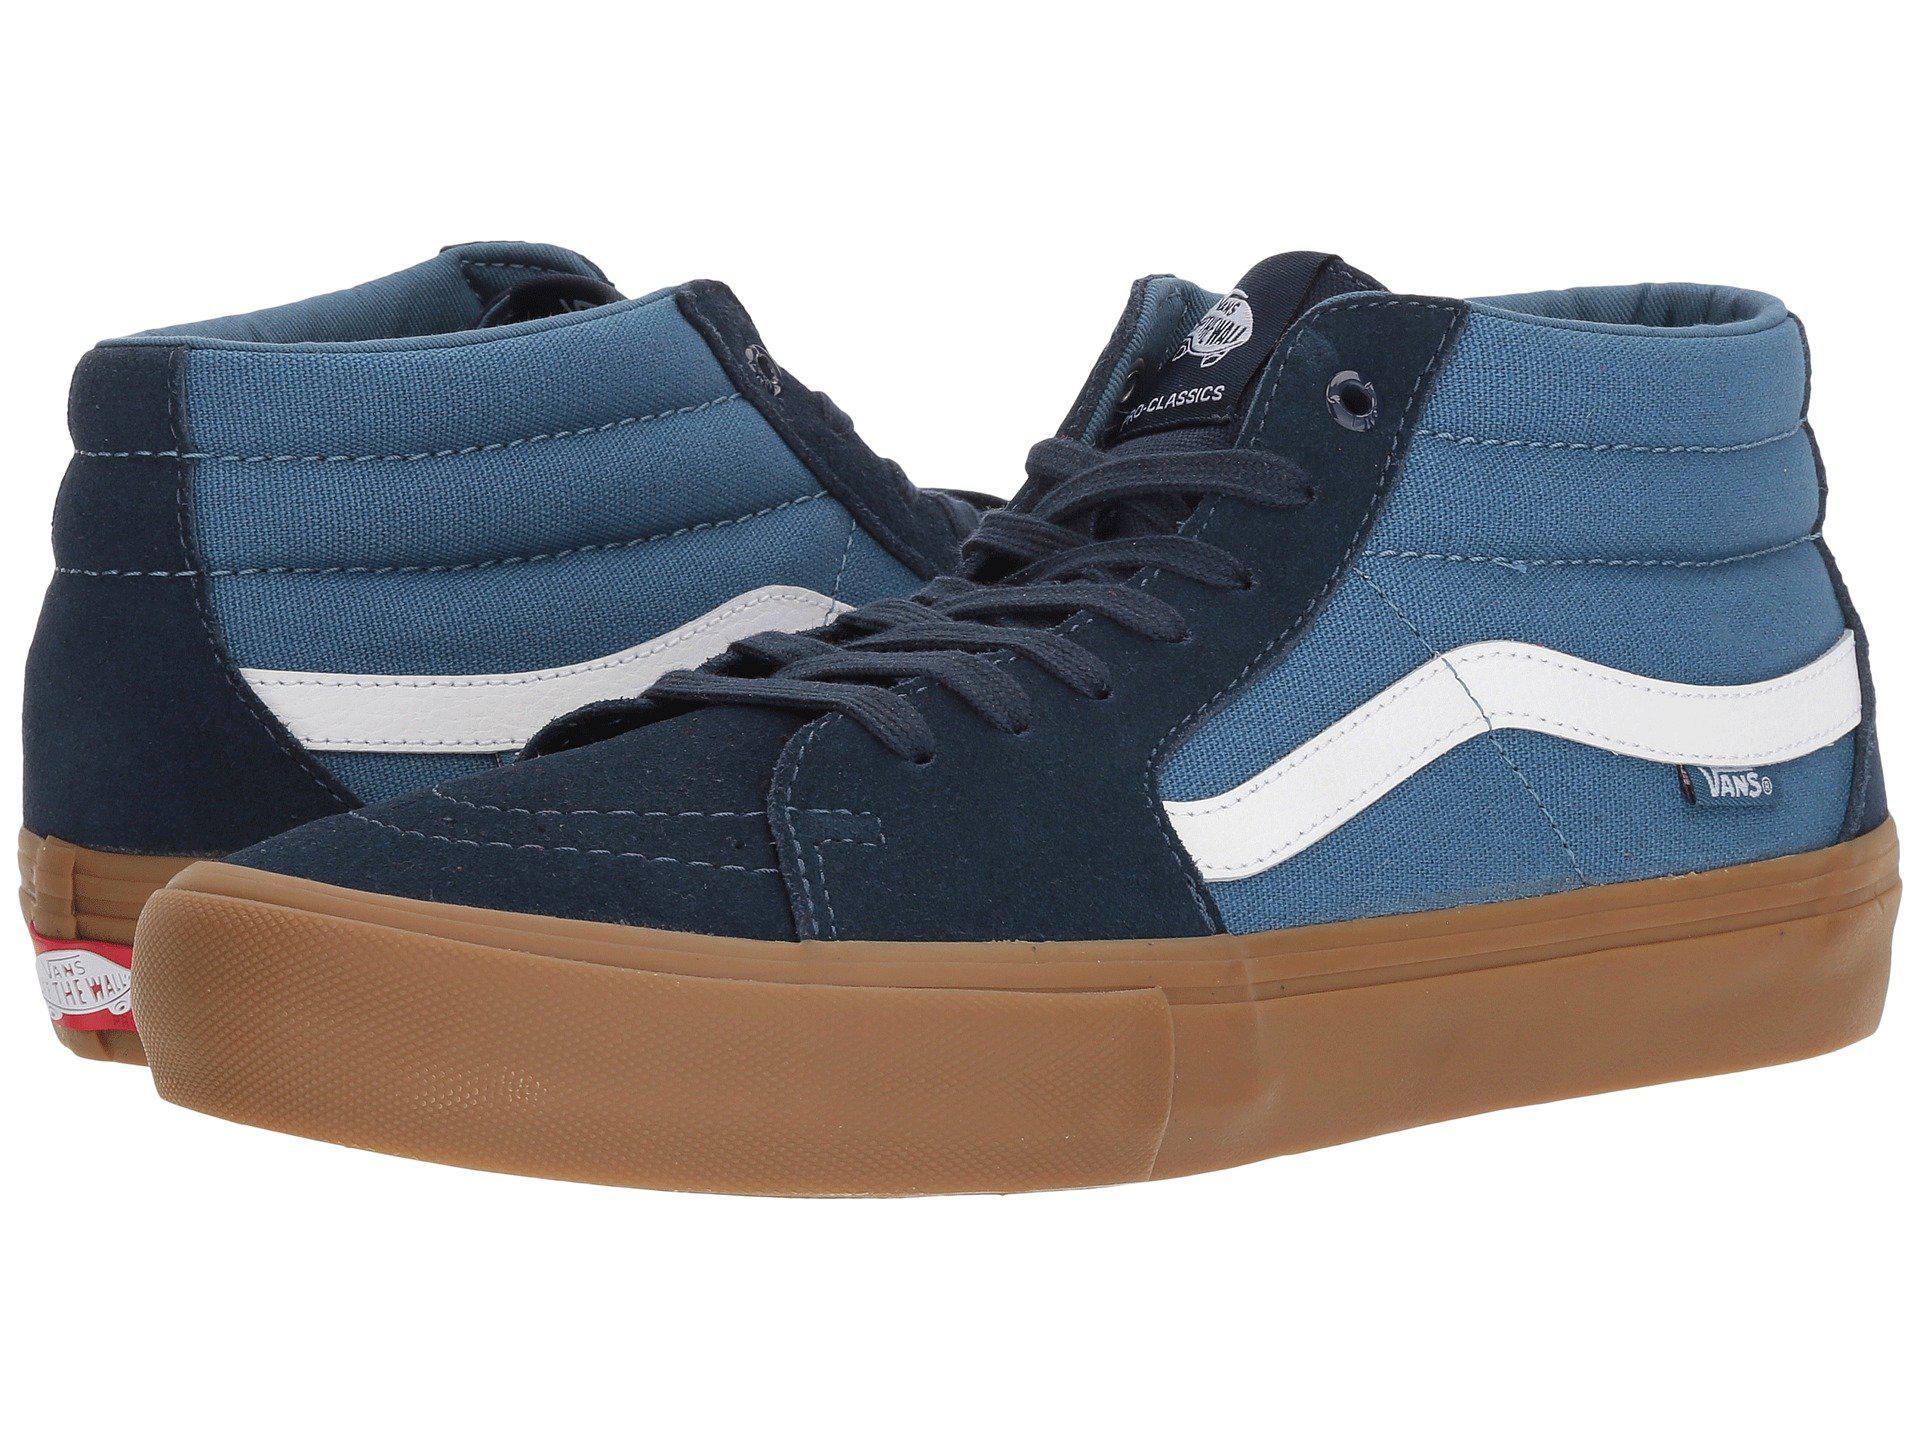 f0b76897e7e29e Lyst - Vans Sk8-mid Pro in Blue for Men